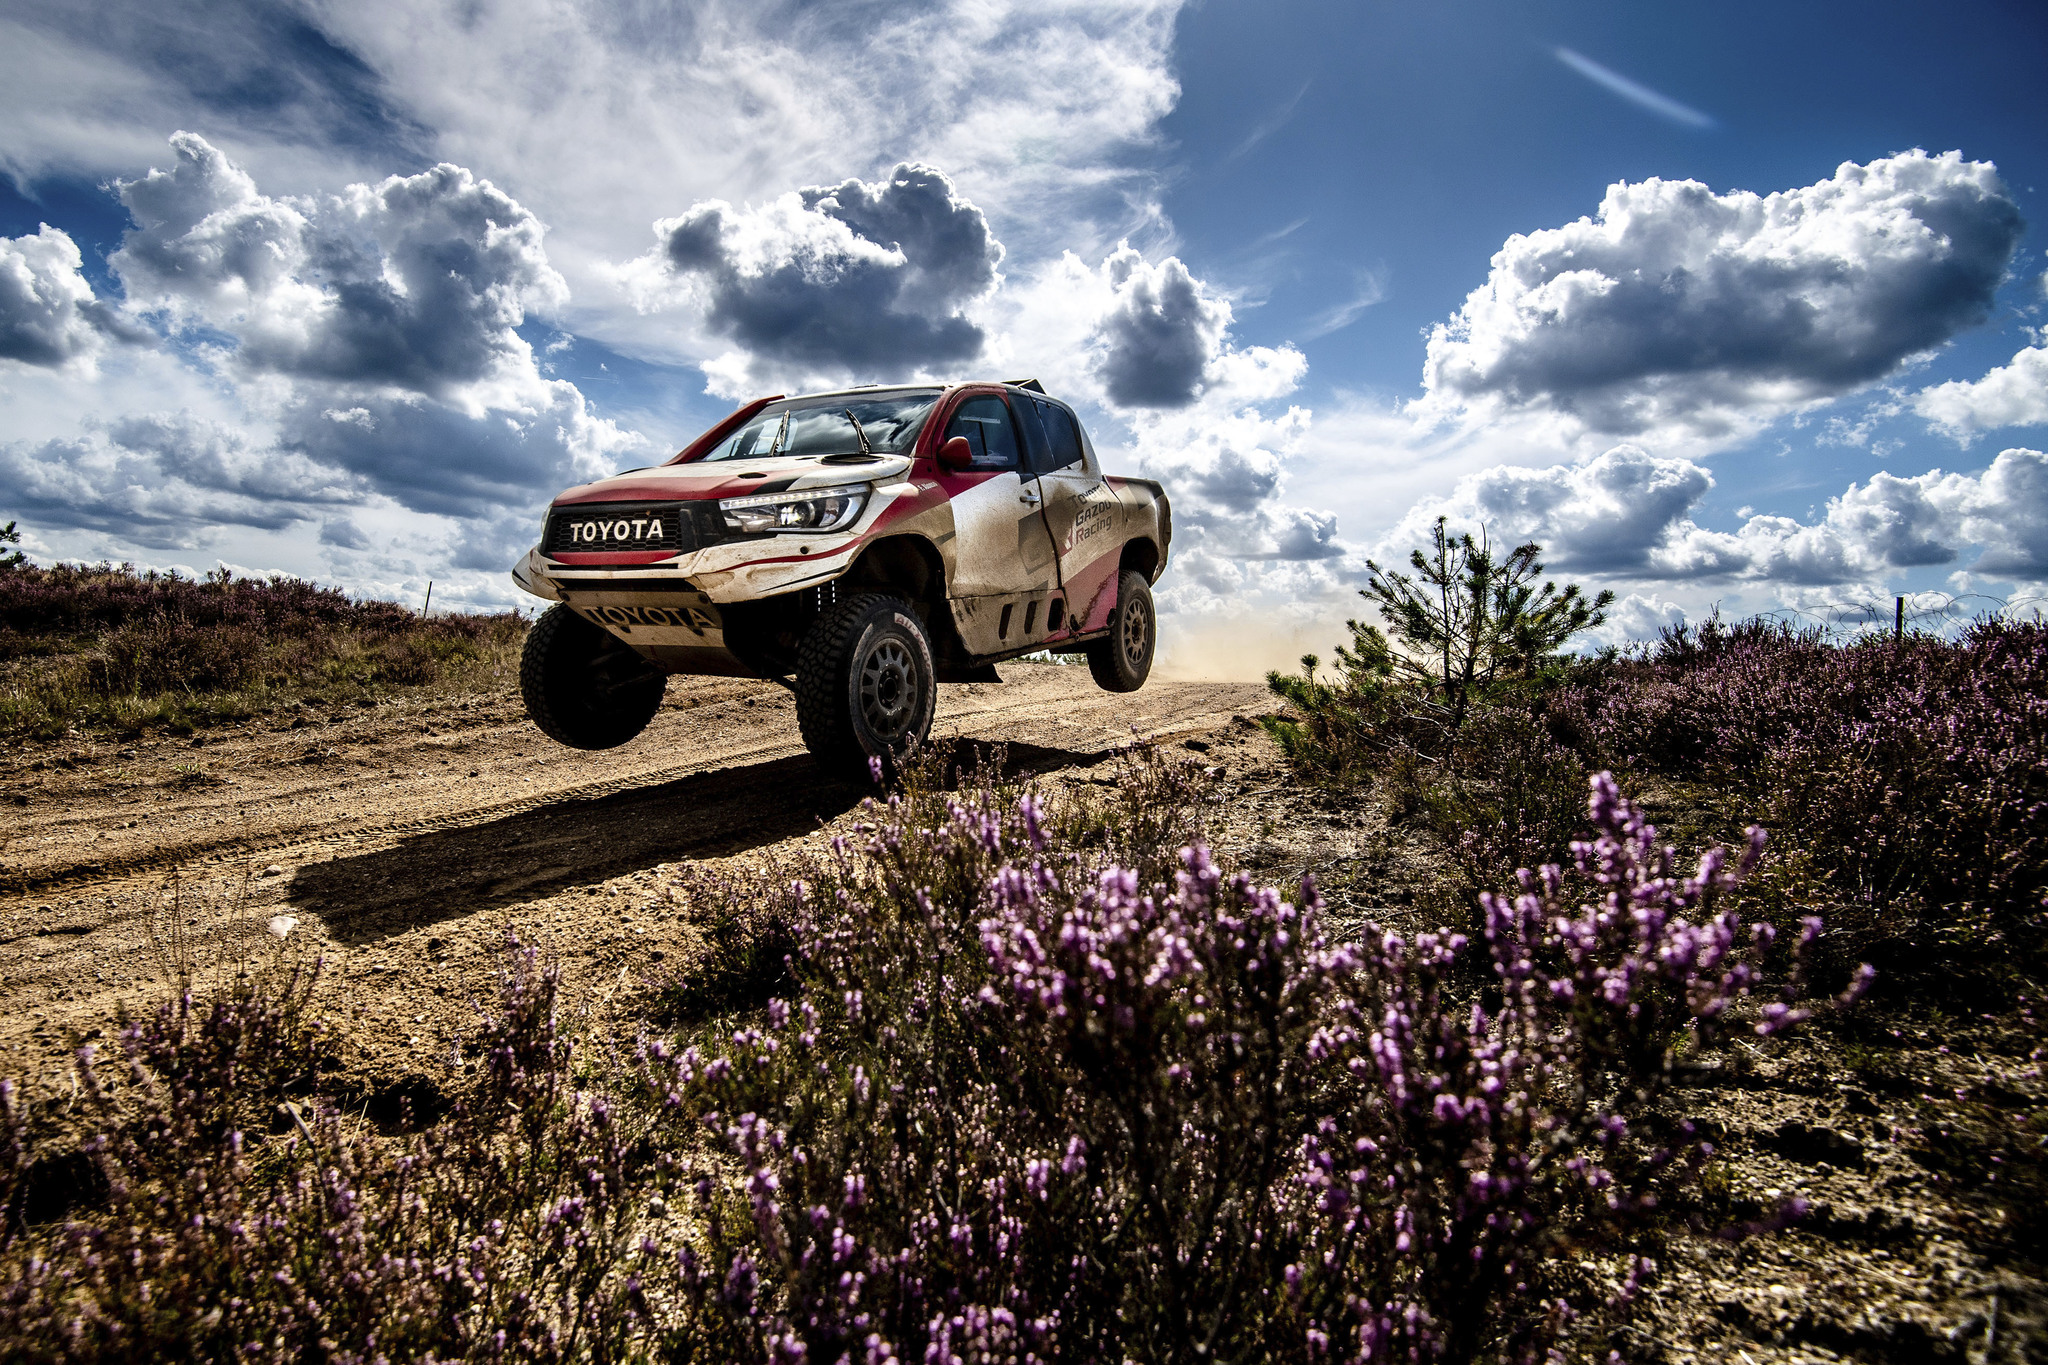 Fotos Fernando <HIT>Alonso</HIT> de test con <HIT>Toyota</HIT> en Polonia Firma: <HIT>Toyota</HIT> Gazoo